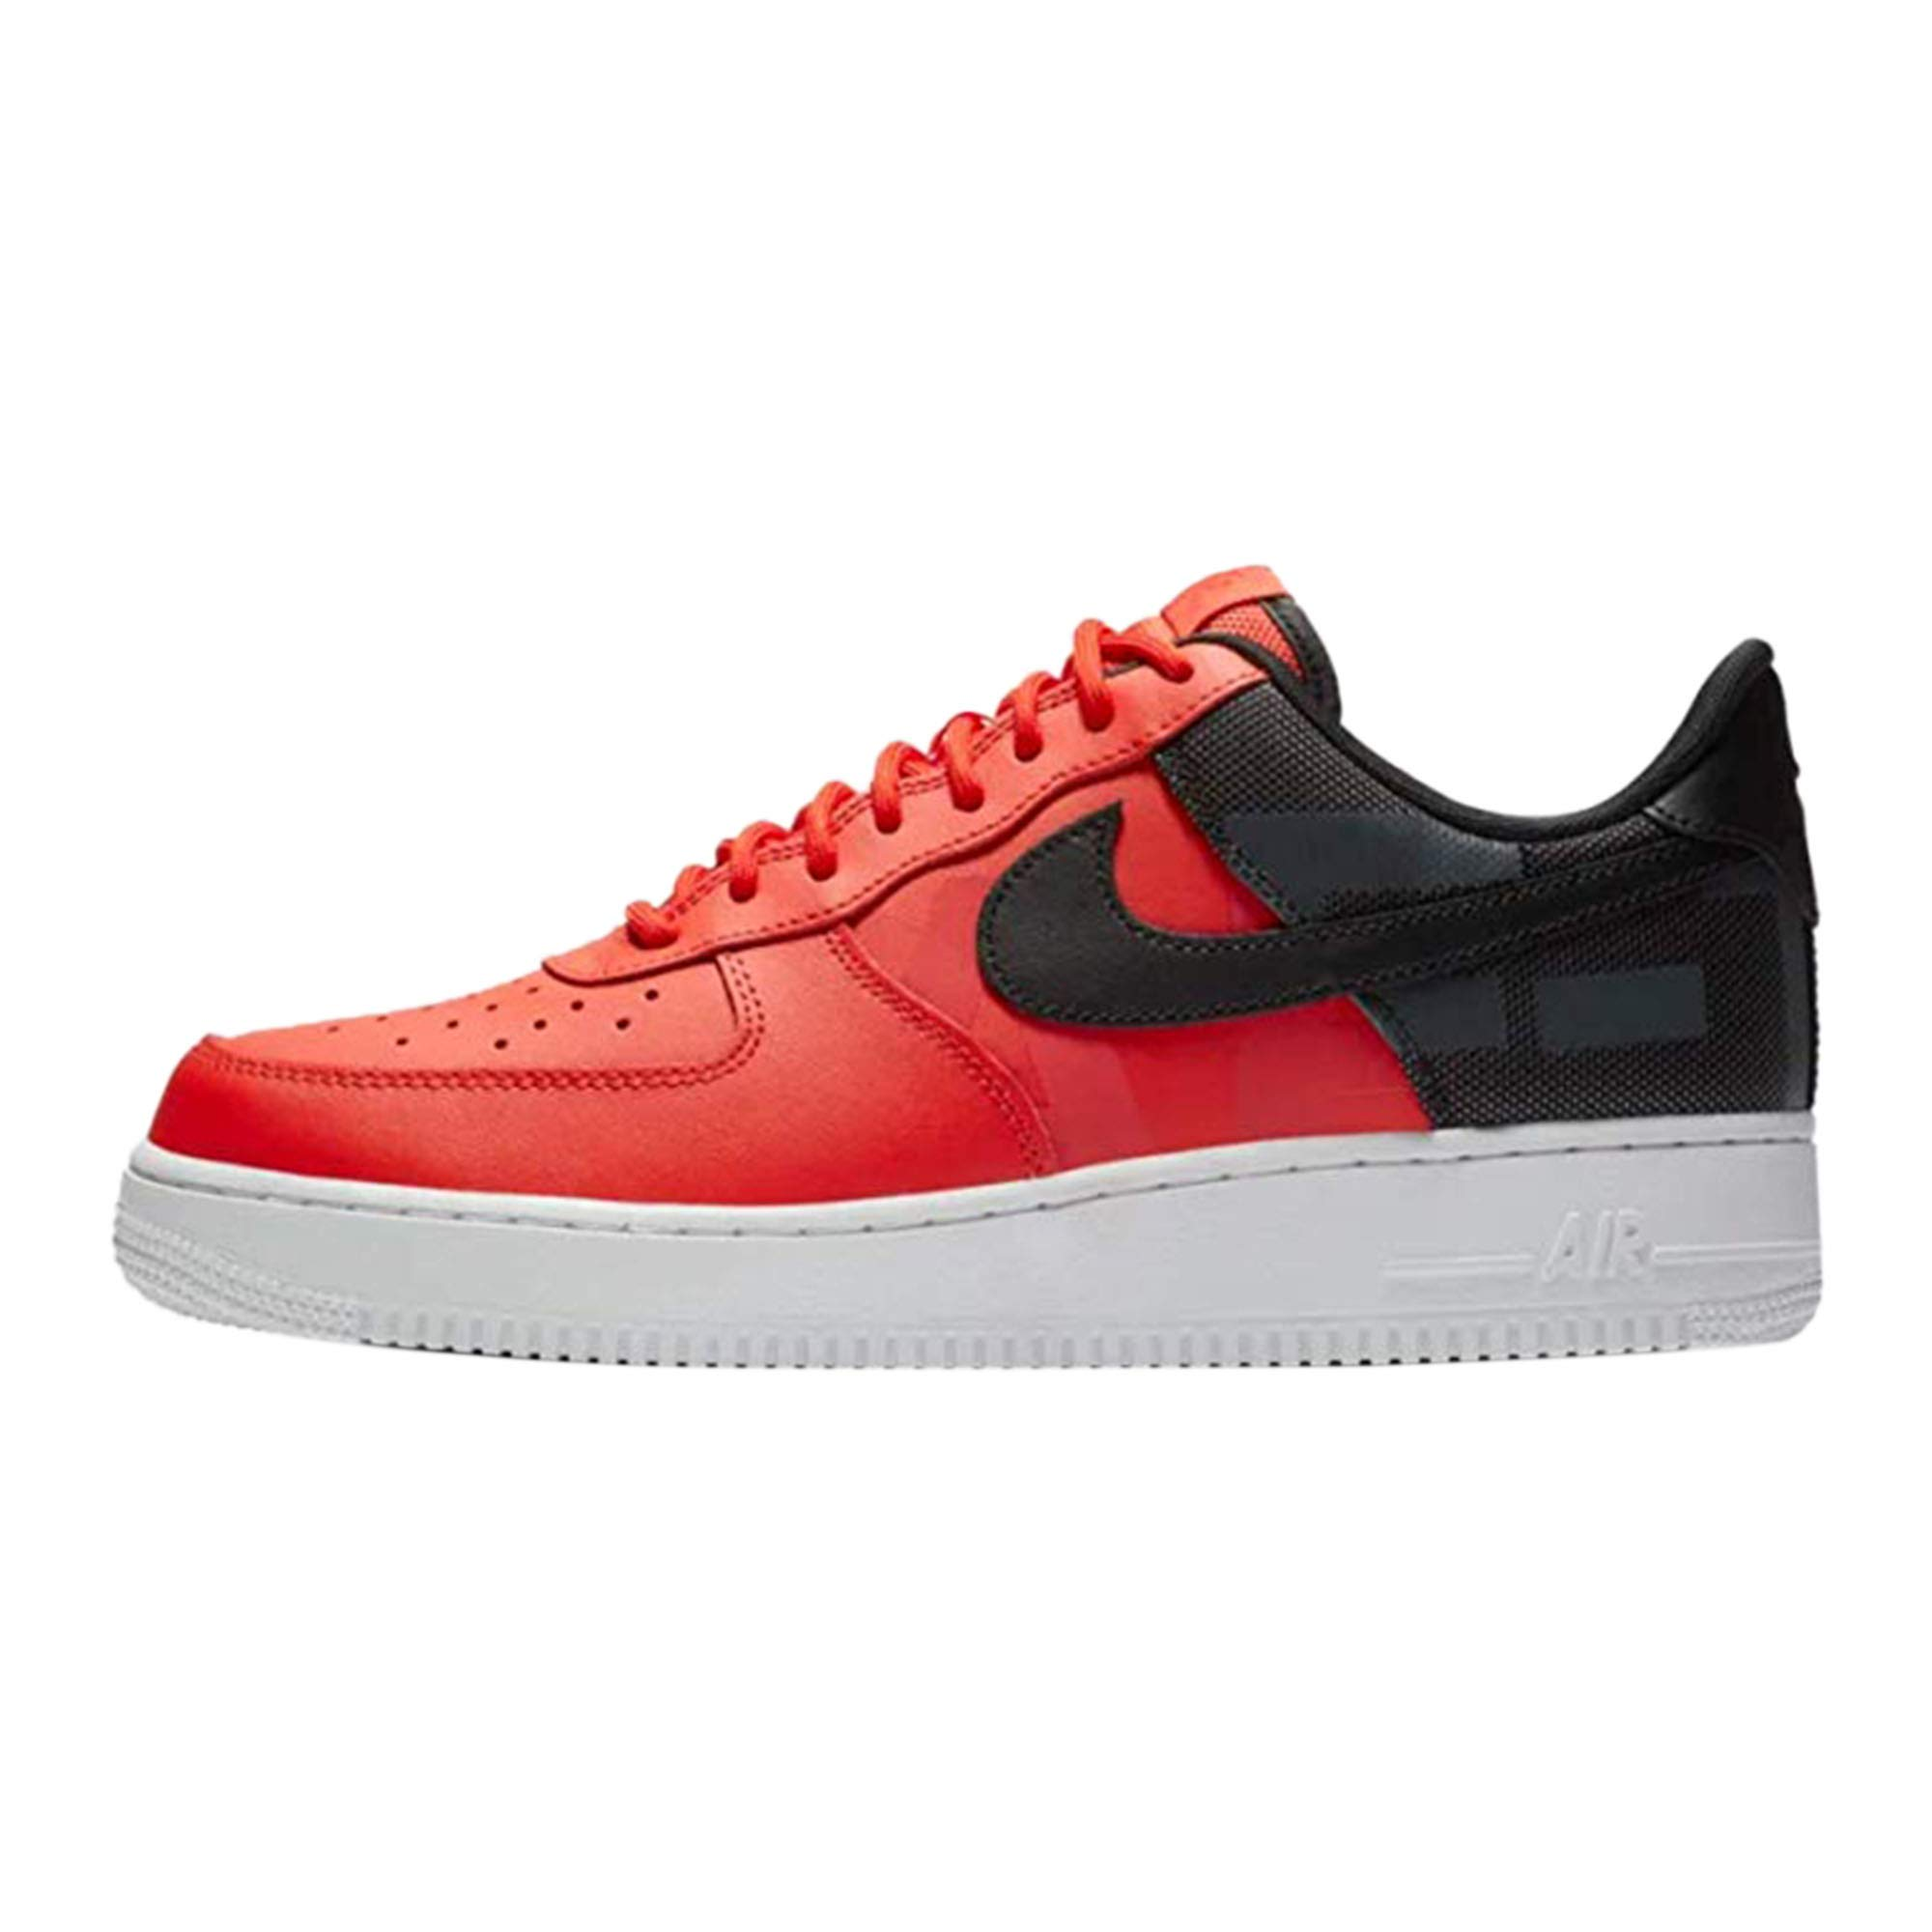 the best attitude e3c95 3c375 Galleon - Nike Air Force 1  07 Lv8 Mens Style  AV8363-600 Size  10.5